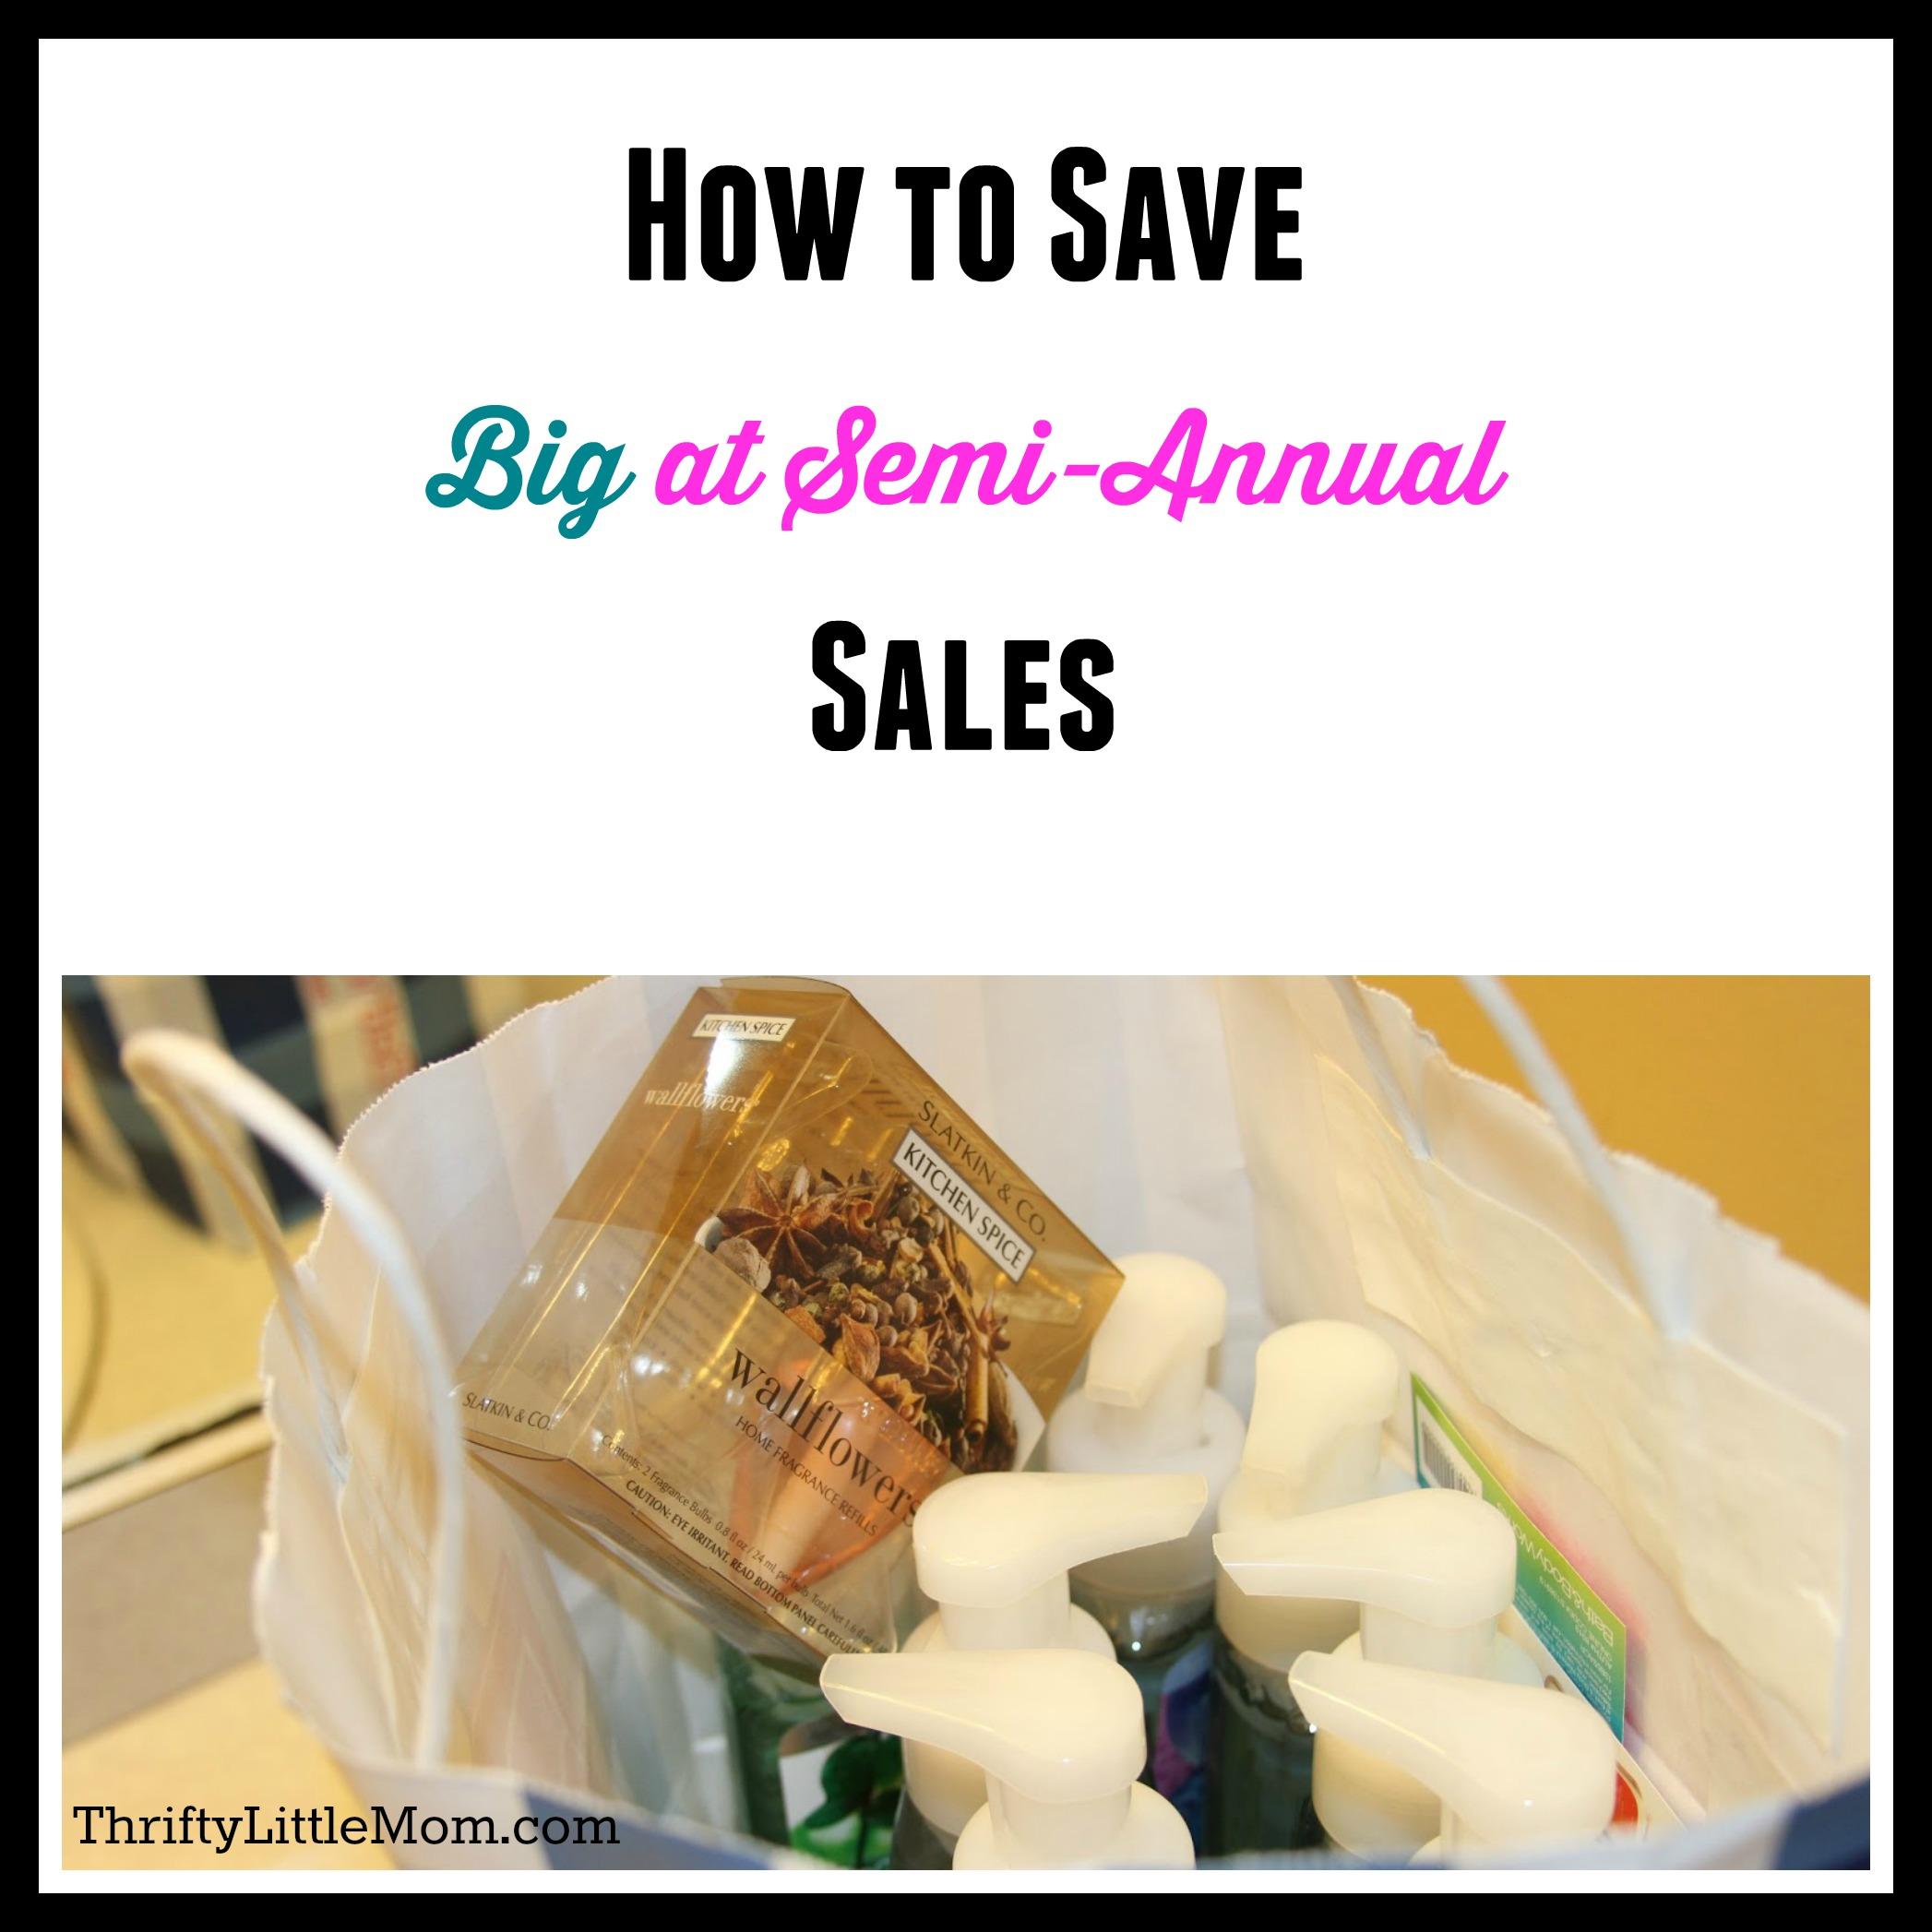 Semi-Annual Sales: Save Big On Stuff You Love